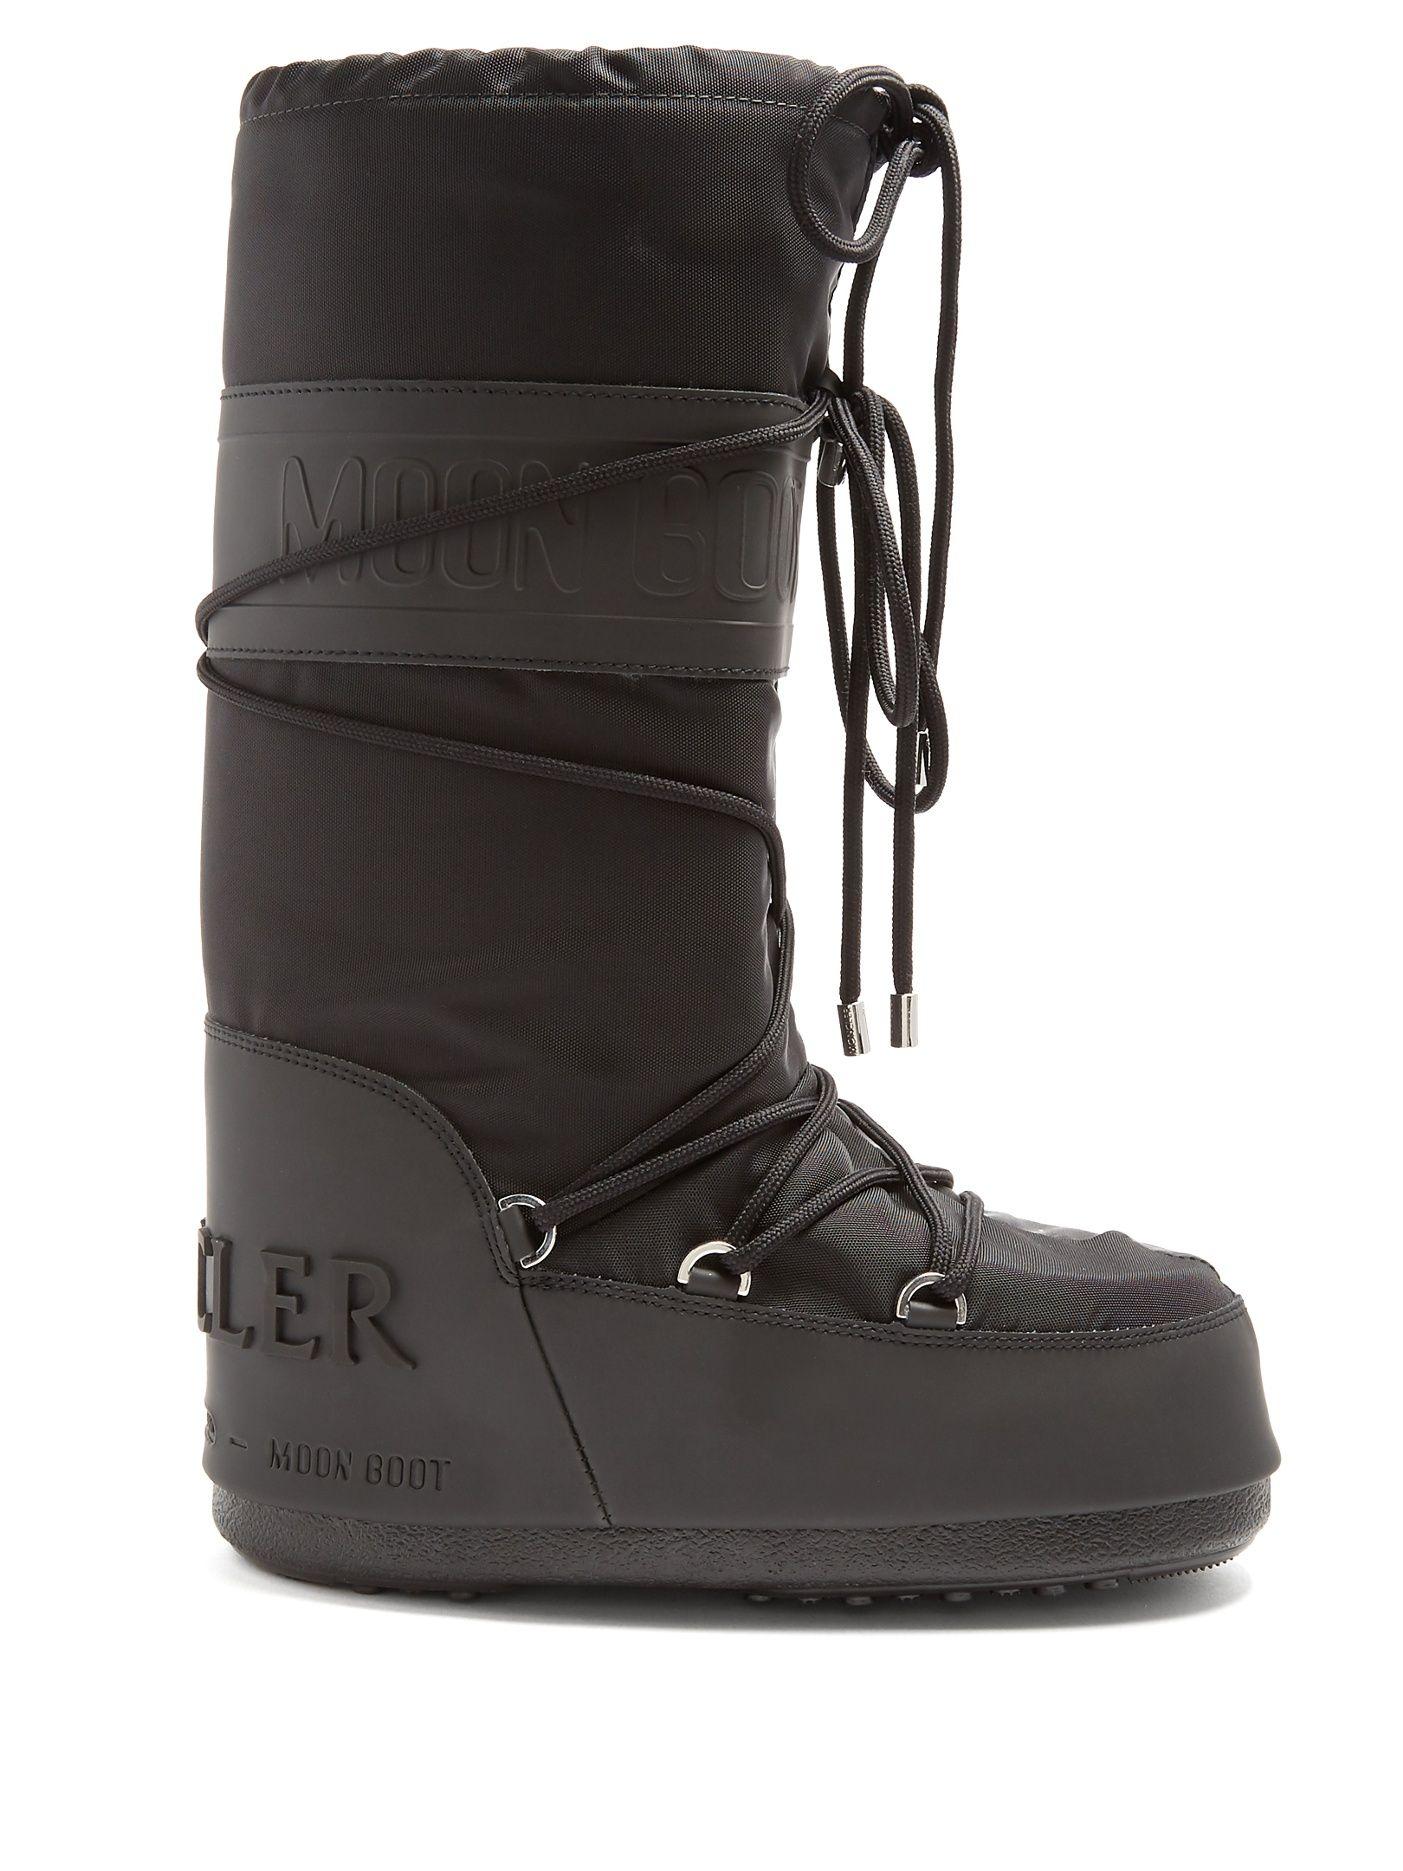 Moncler X Moon Boot